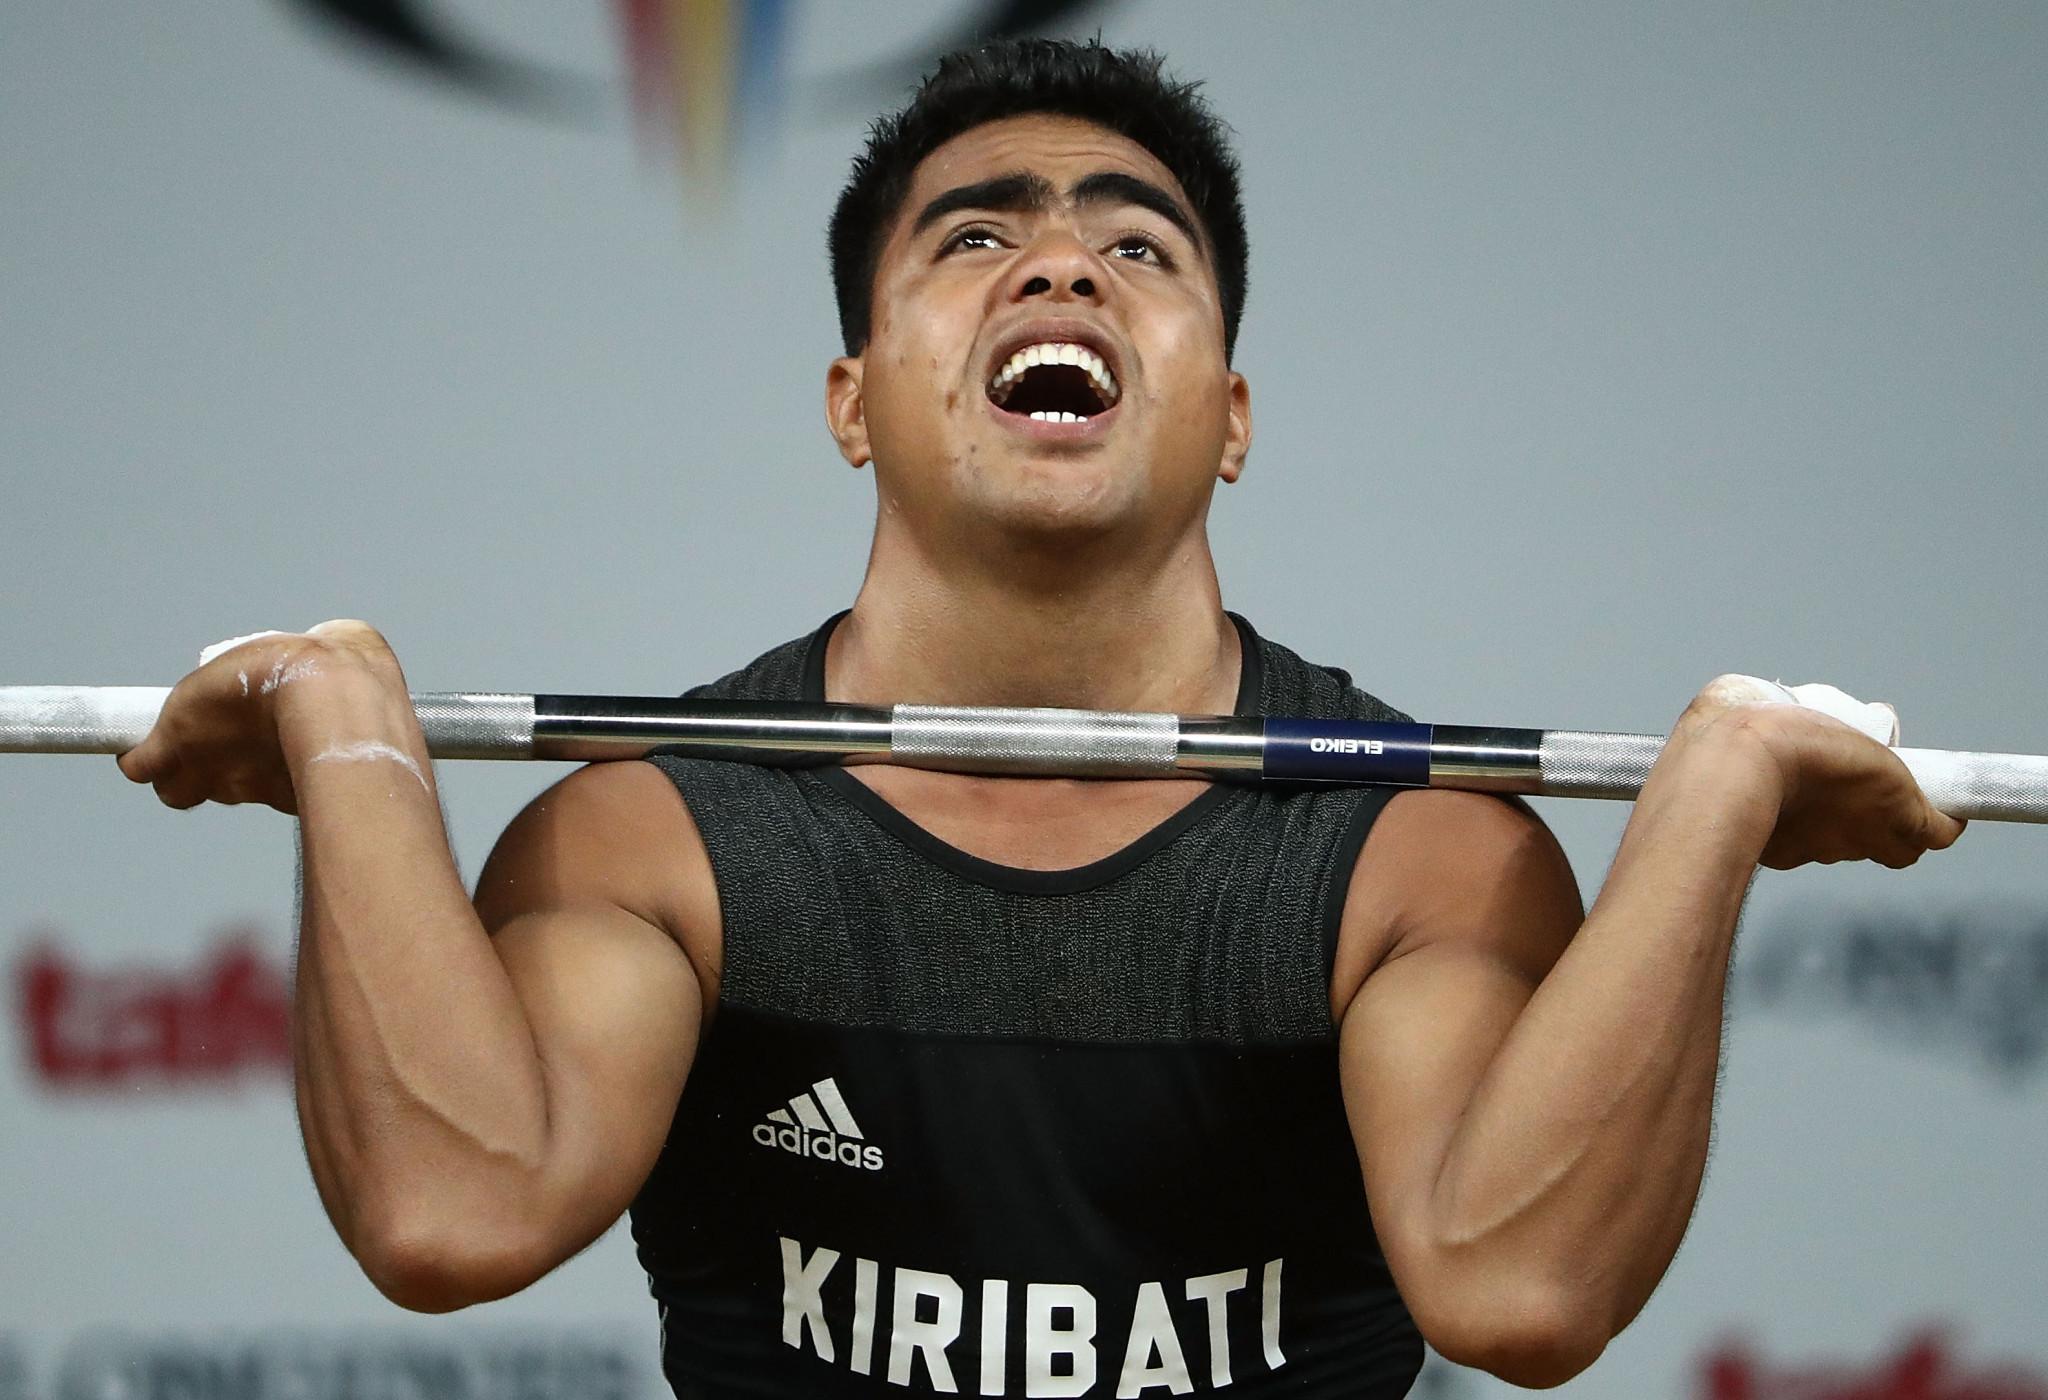 Kiribati NOC sending three athletes to compete at Tokyo 2020 Olympics